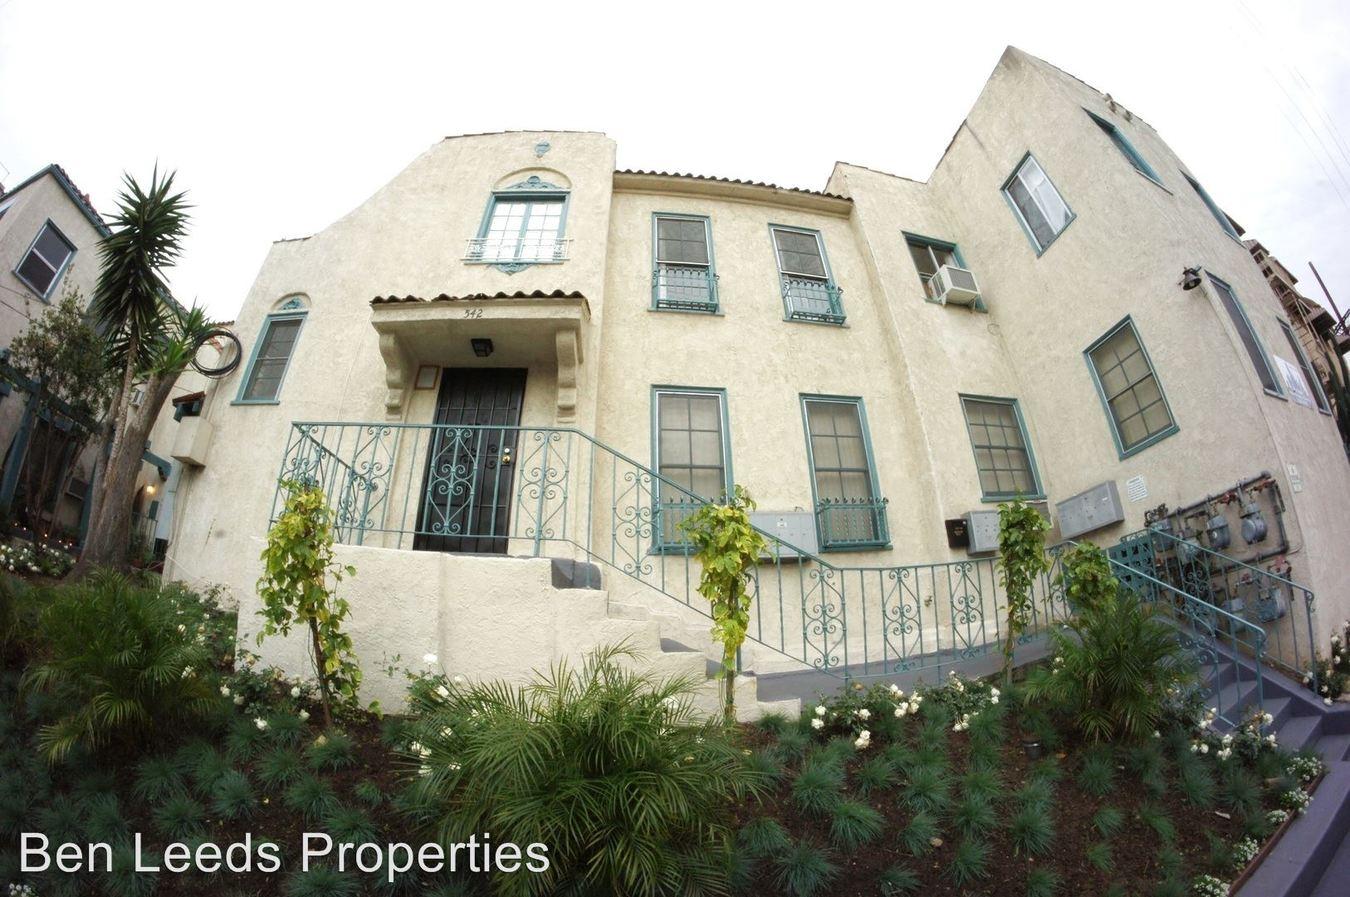 1 Bedroom 1 Bathroom Apartment for rent at 534-542 S. Coronado St. in Los Angeles, CA